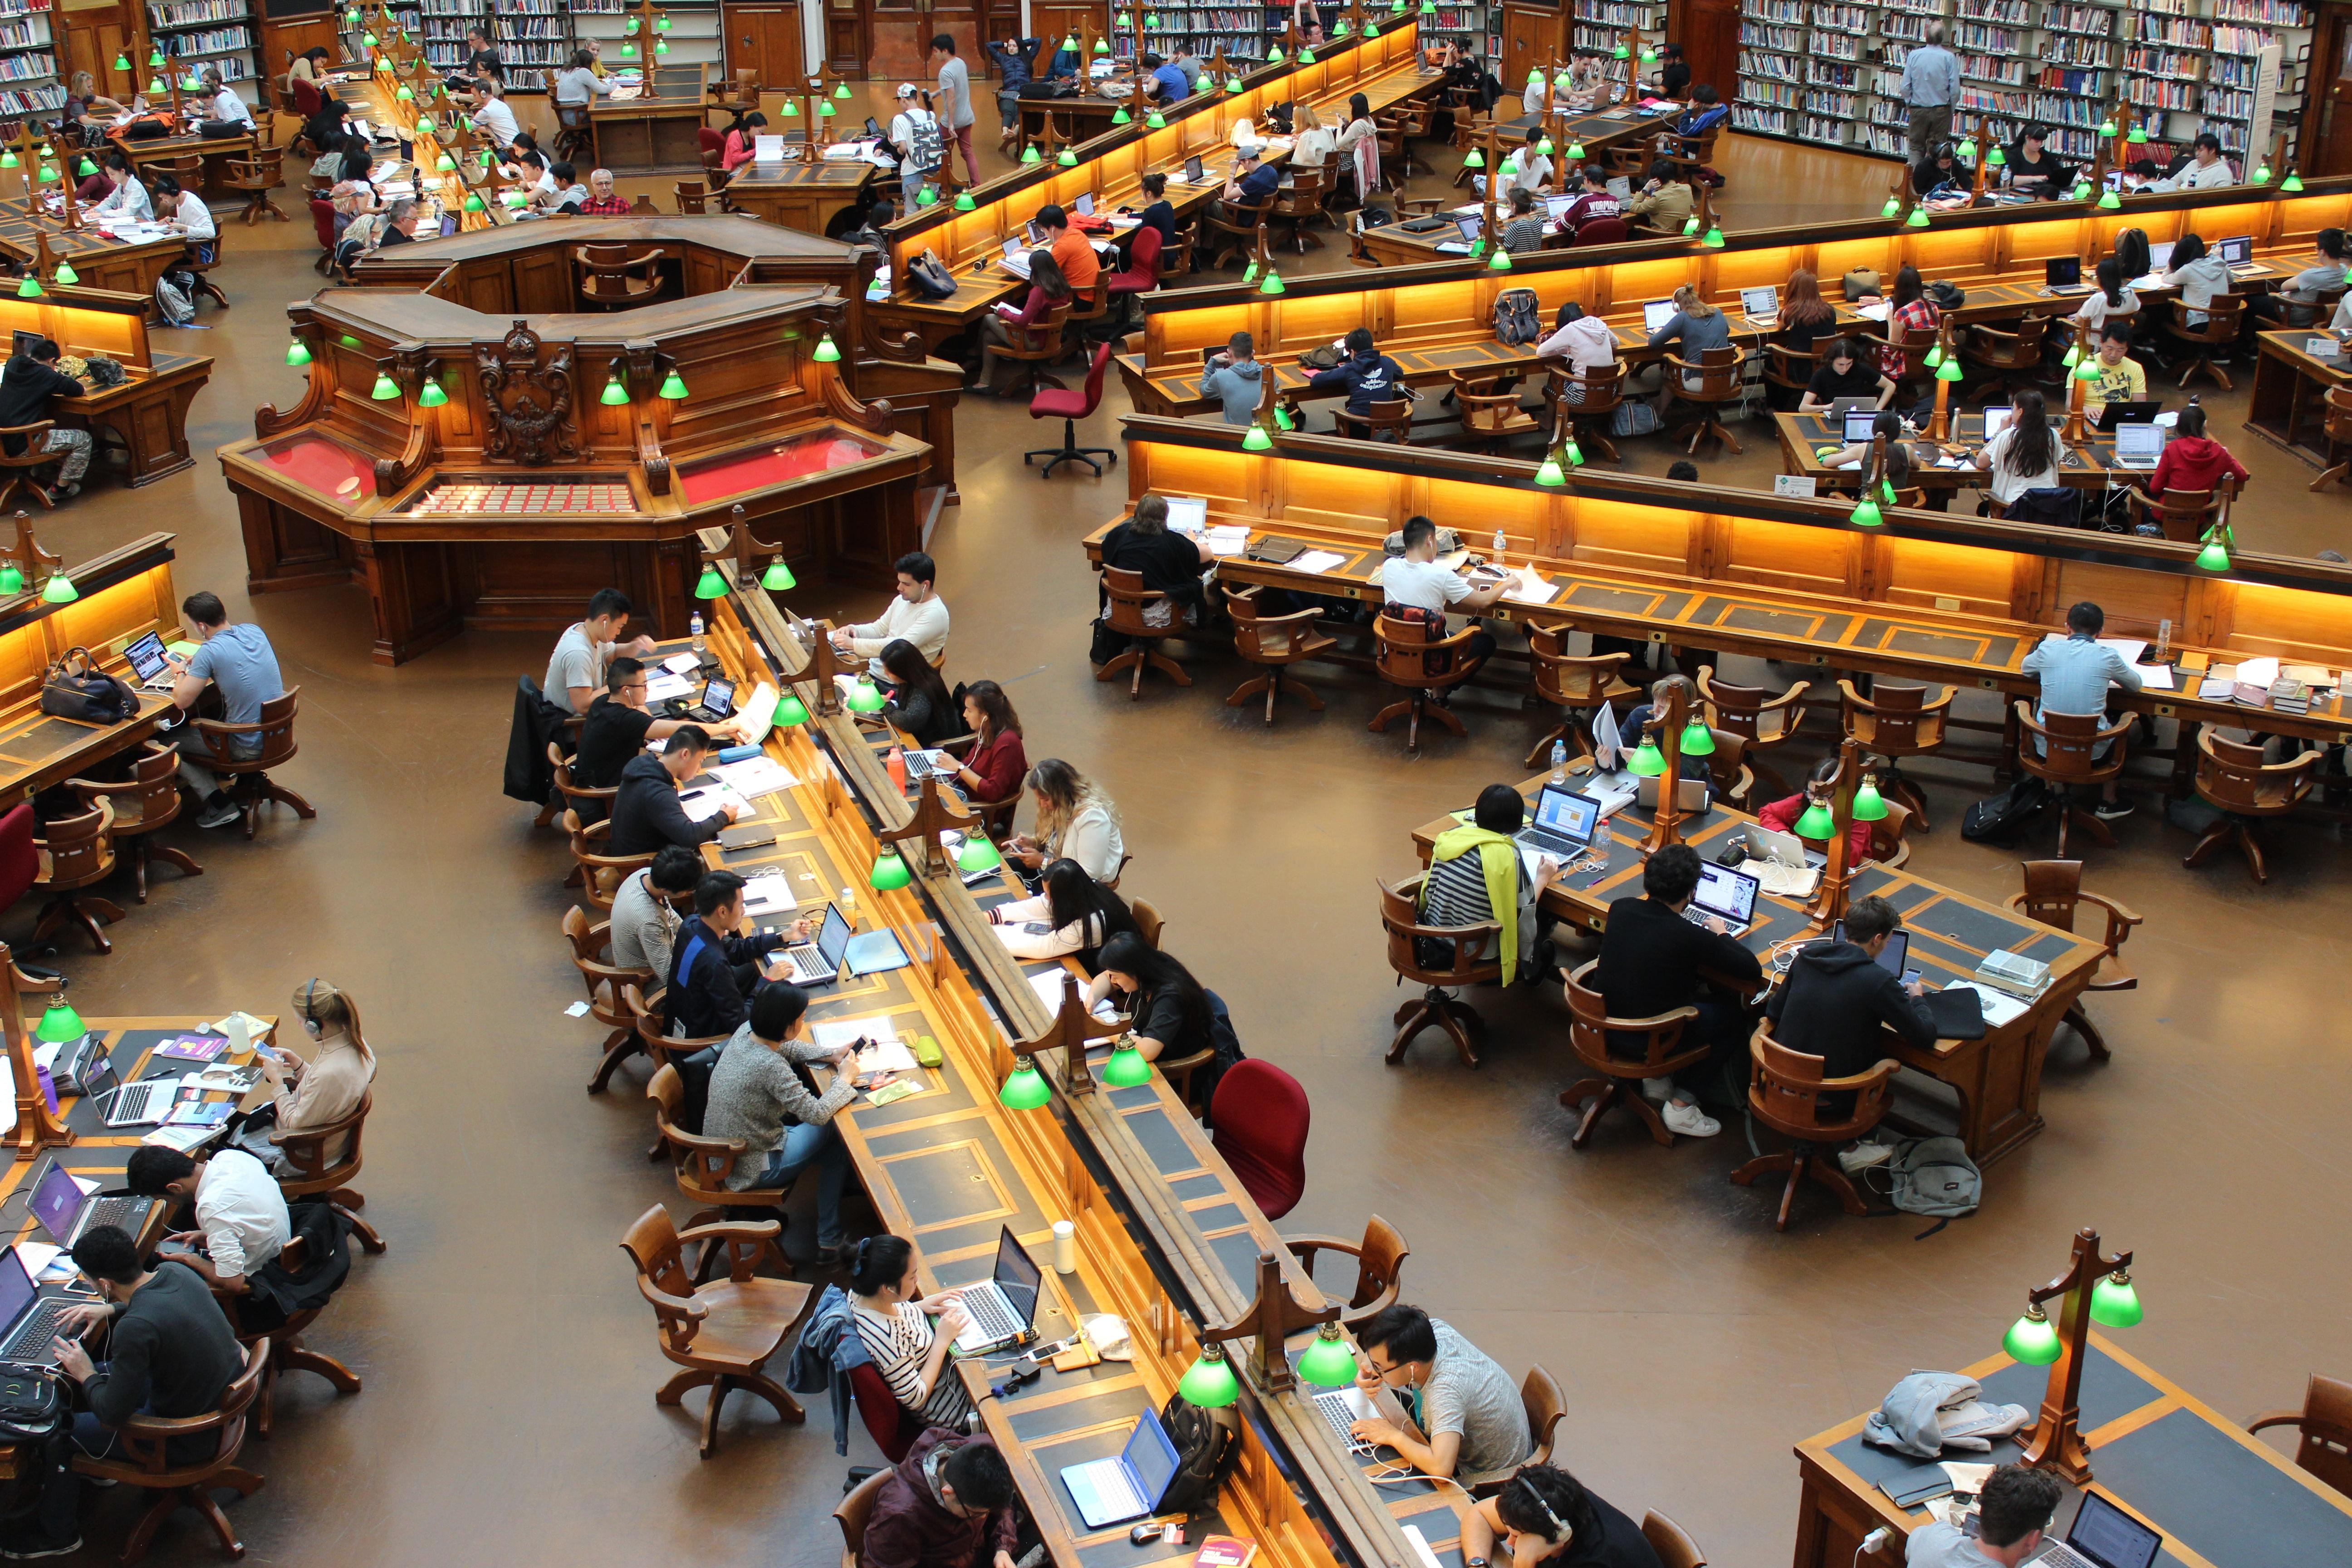 https://static.pexels.com/photos/159775/library-la-trobe-study-students-159775.jpeg